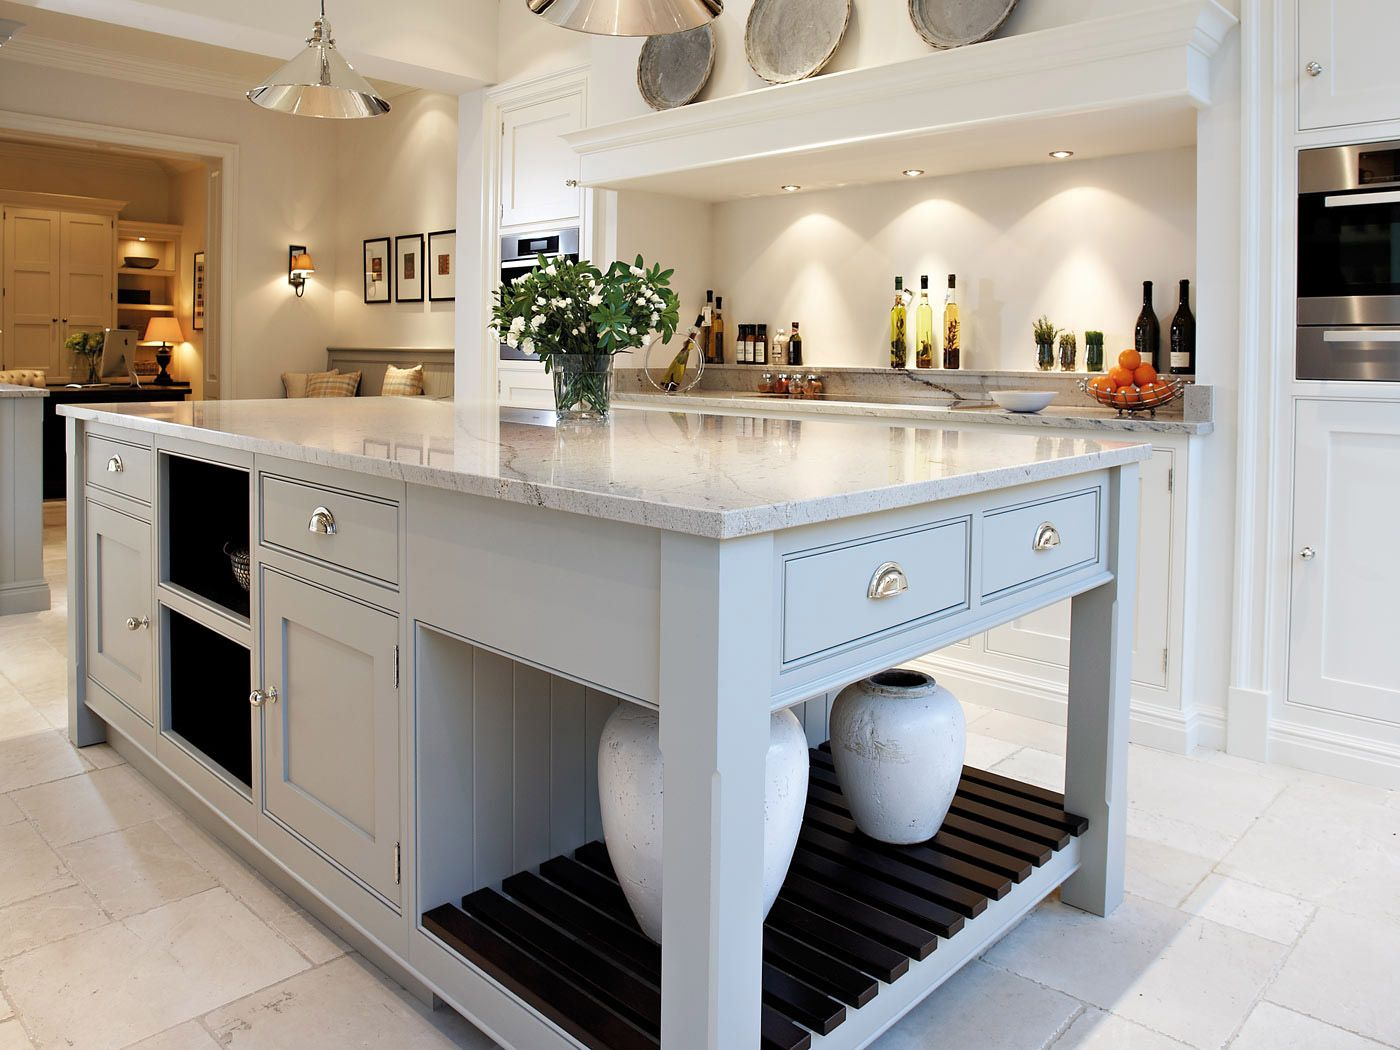 Bespoke Kitchen Island   A Contemporary Classic Style Kitchen Contemporary Shaker  Kitchen